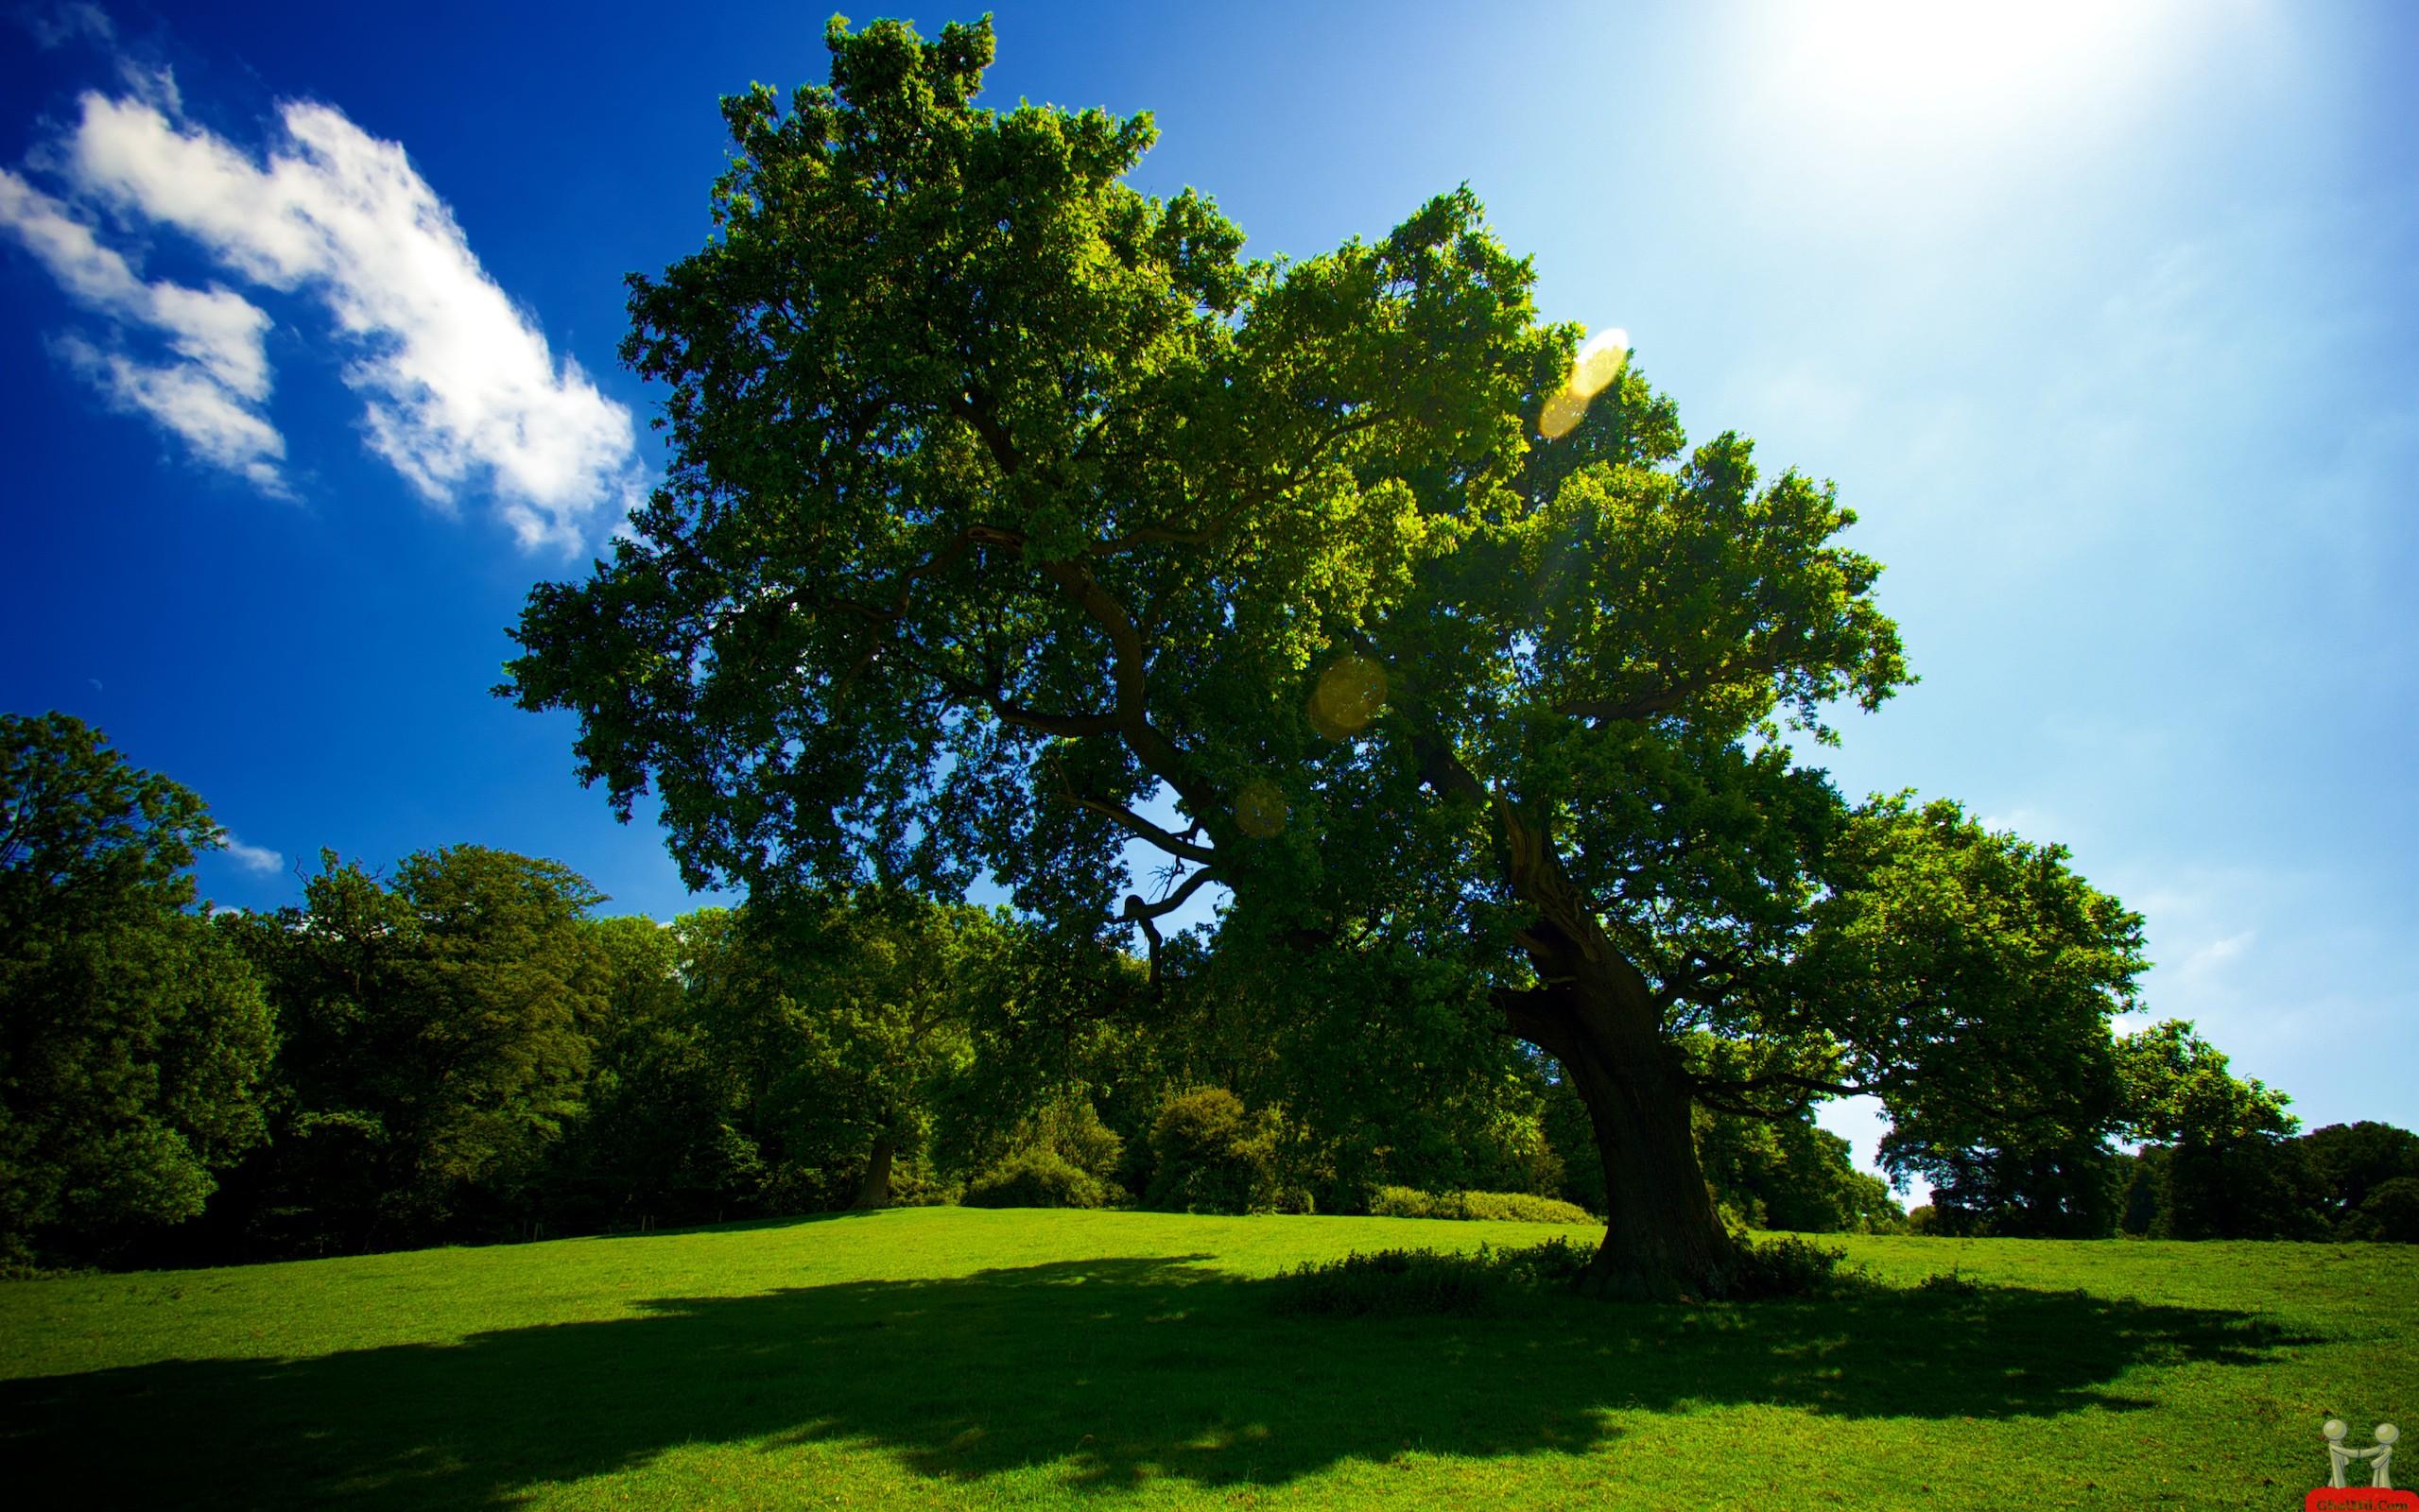 Beautiful Big Green Tree HD Wallpaper HD Wallpapers Download 2559x1600